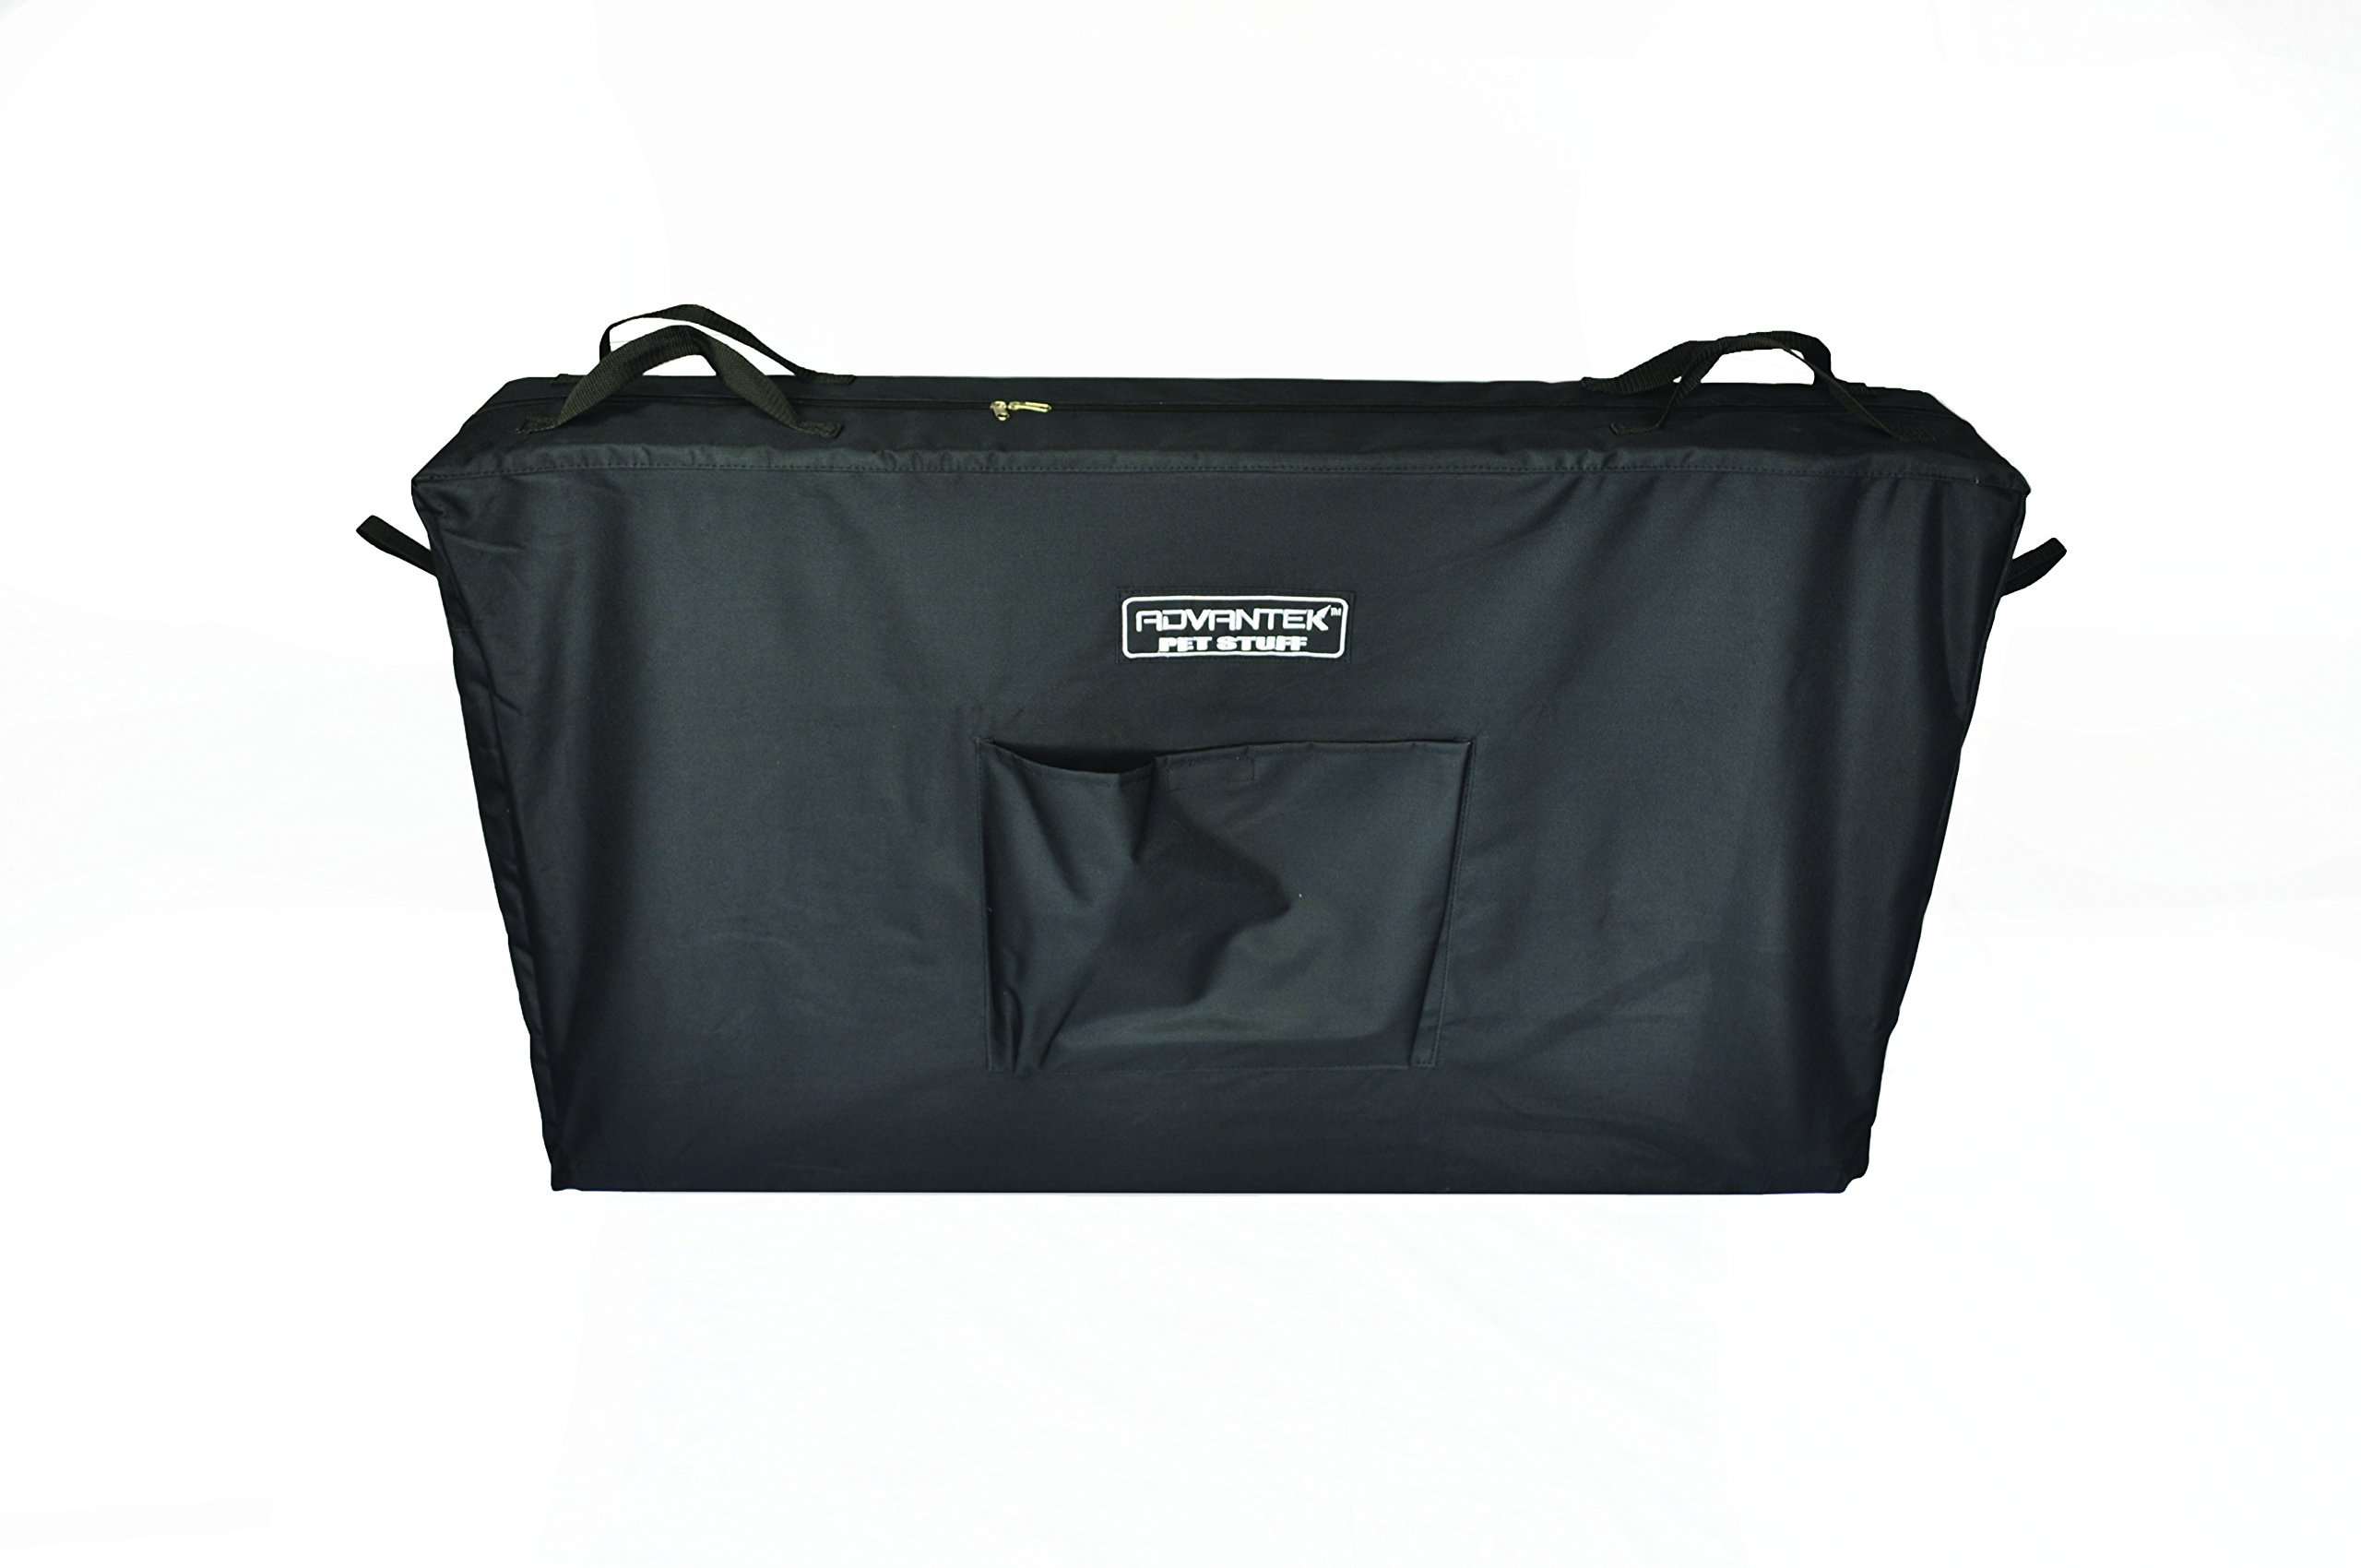 Advantek The Original Pet Gazebo Tote Bag - Medium